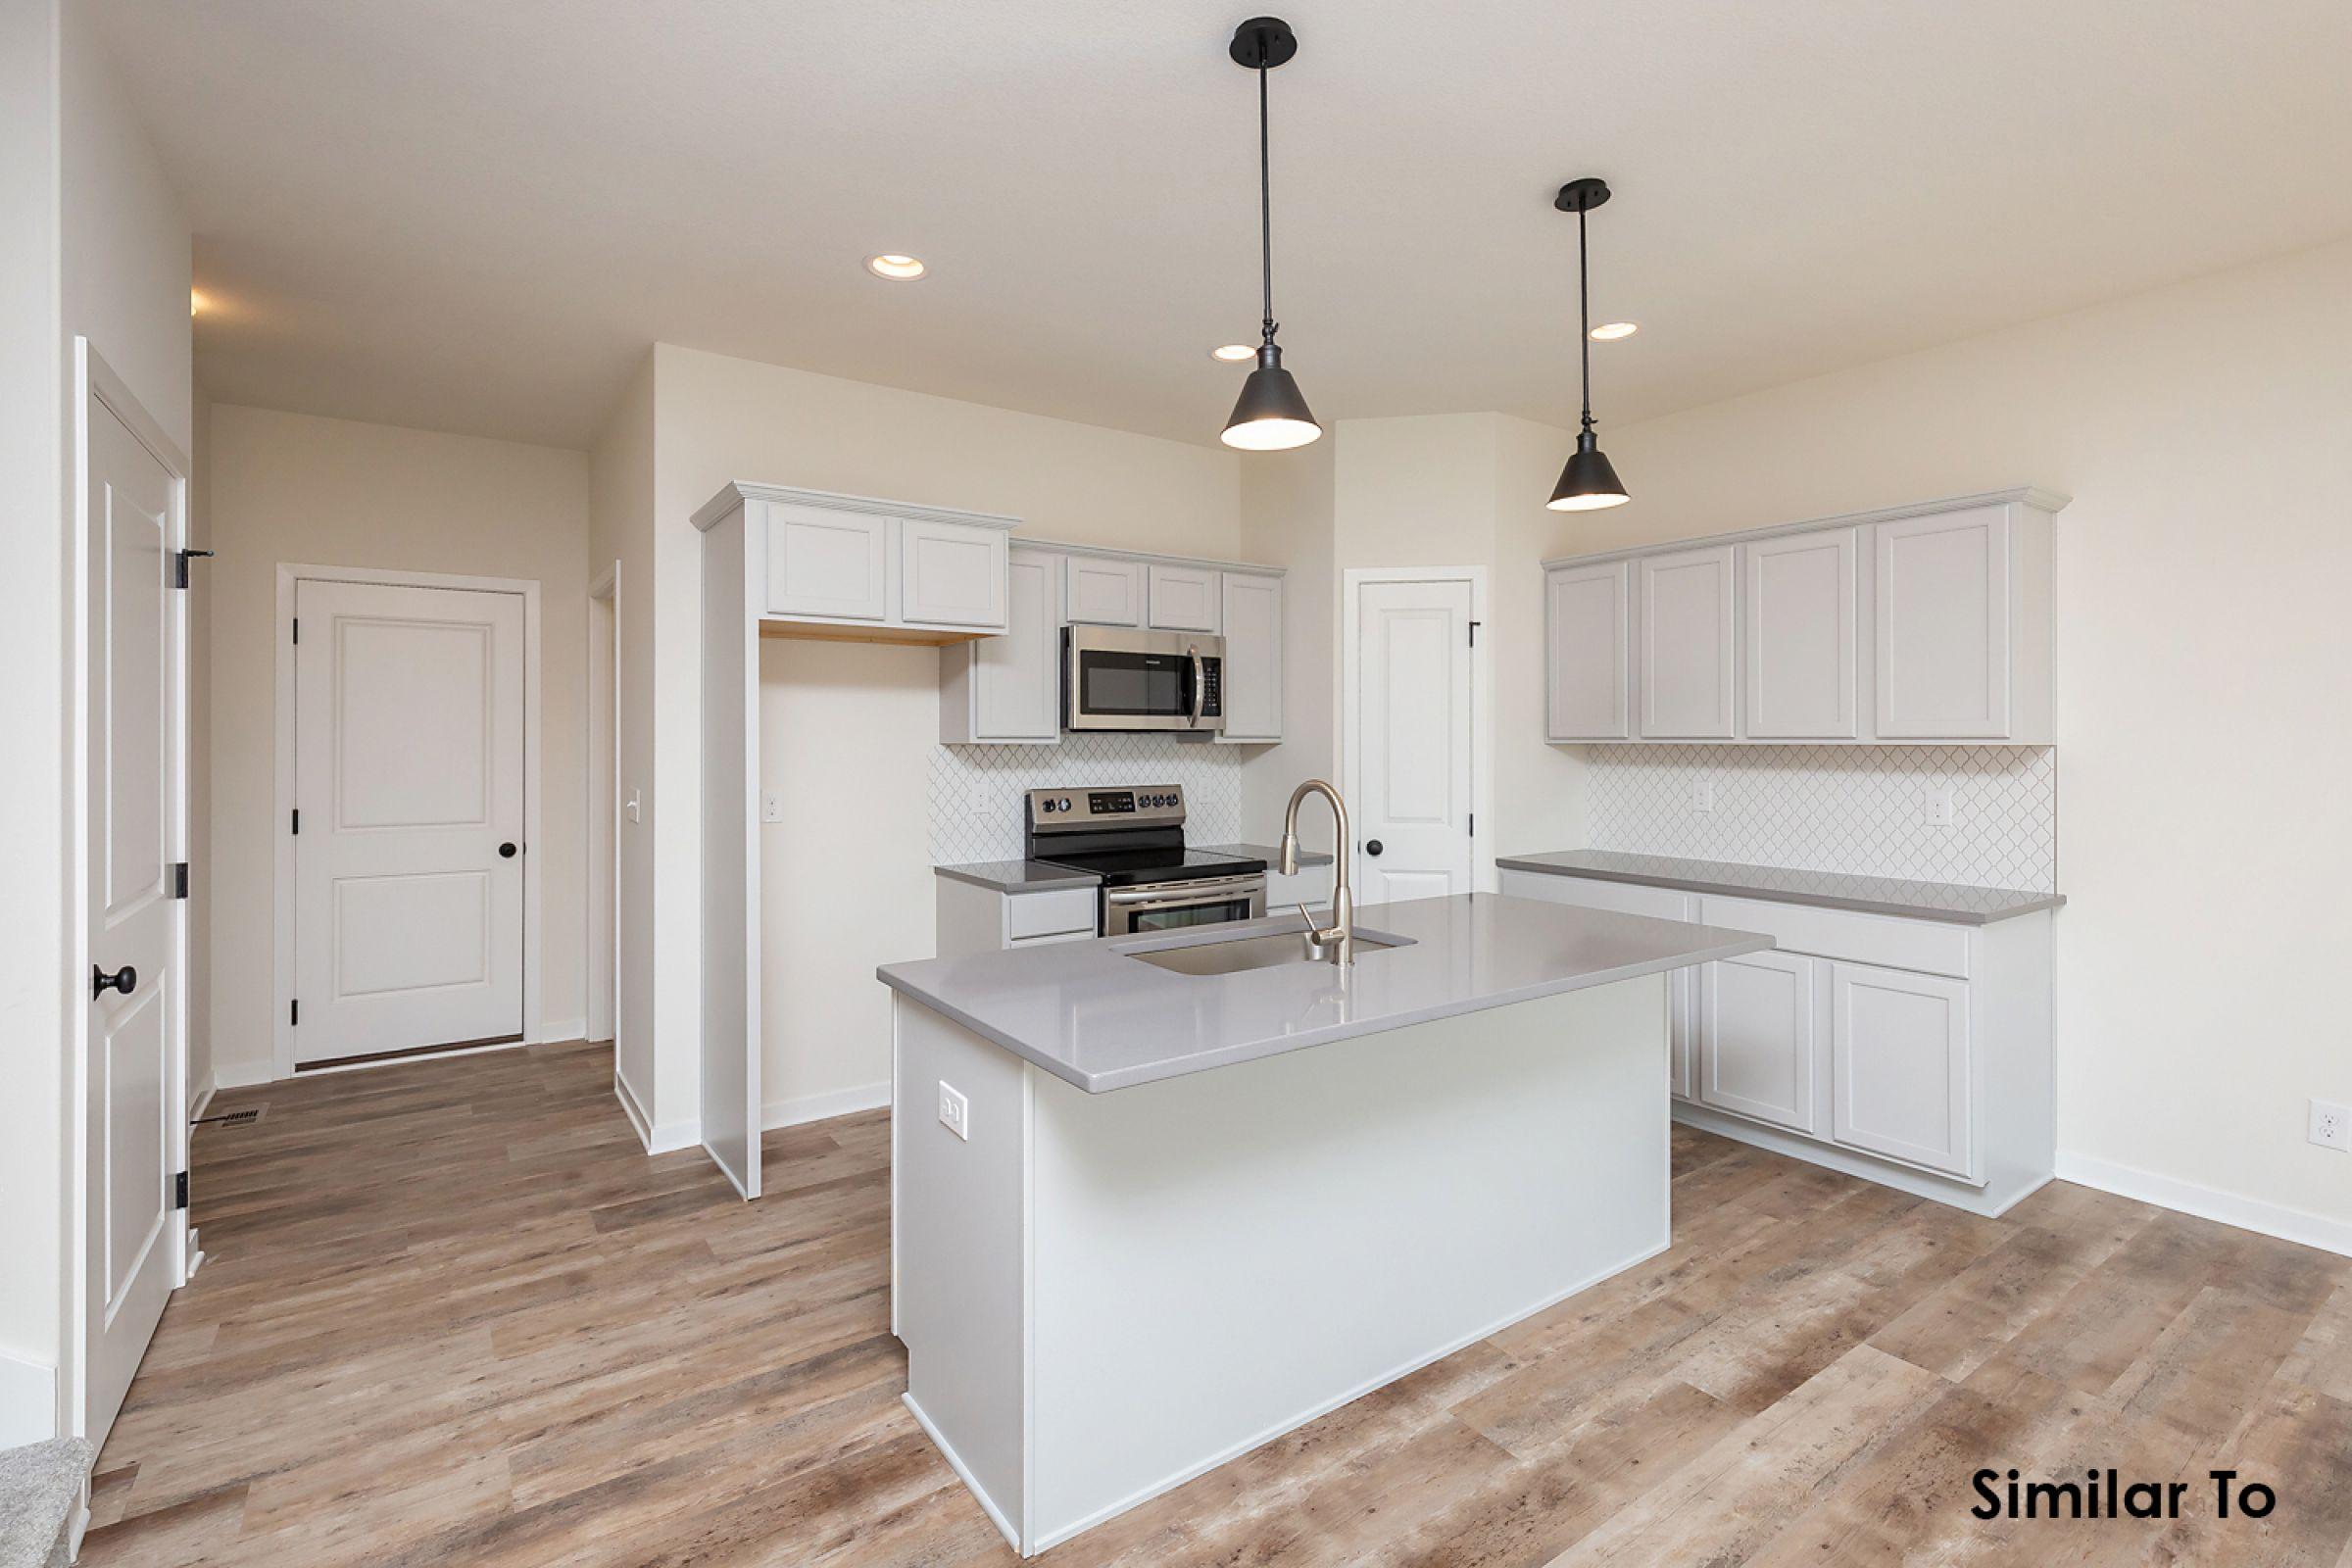 residential-warren-county-iowa-0-acres-listing-number-15134-2-2020-08-27-185016.jpg